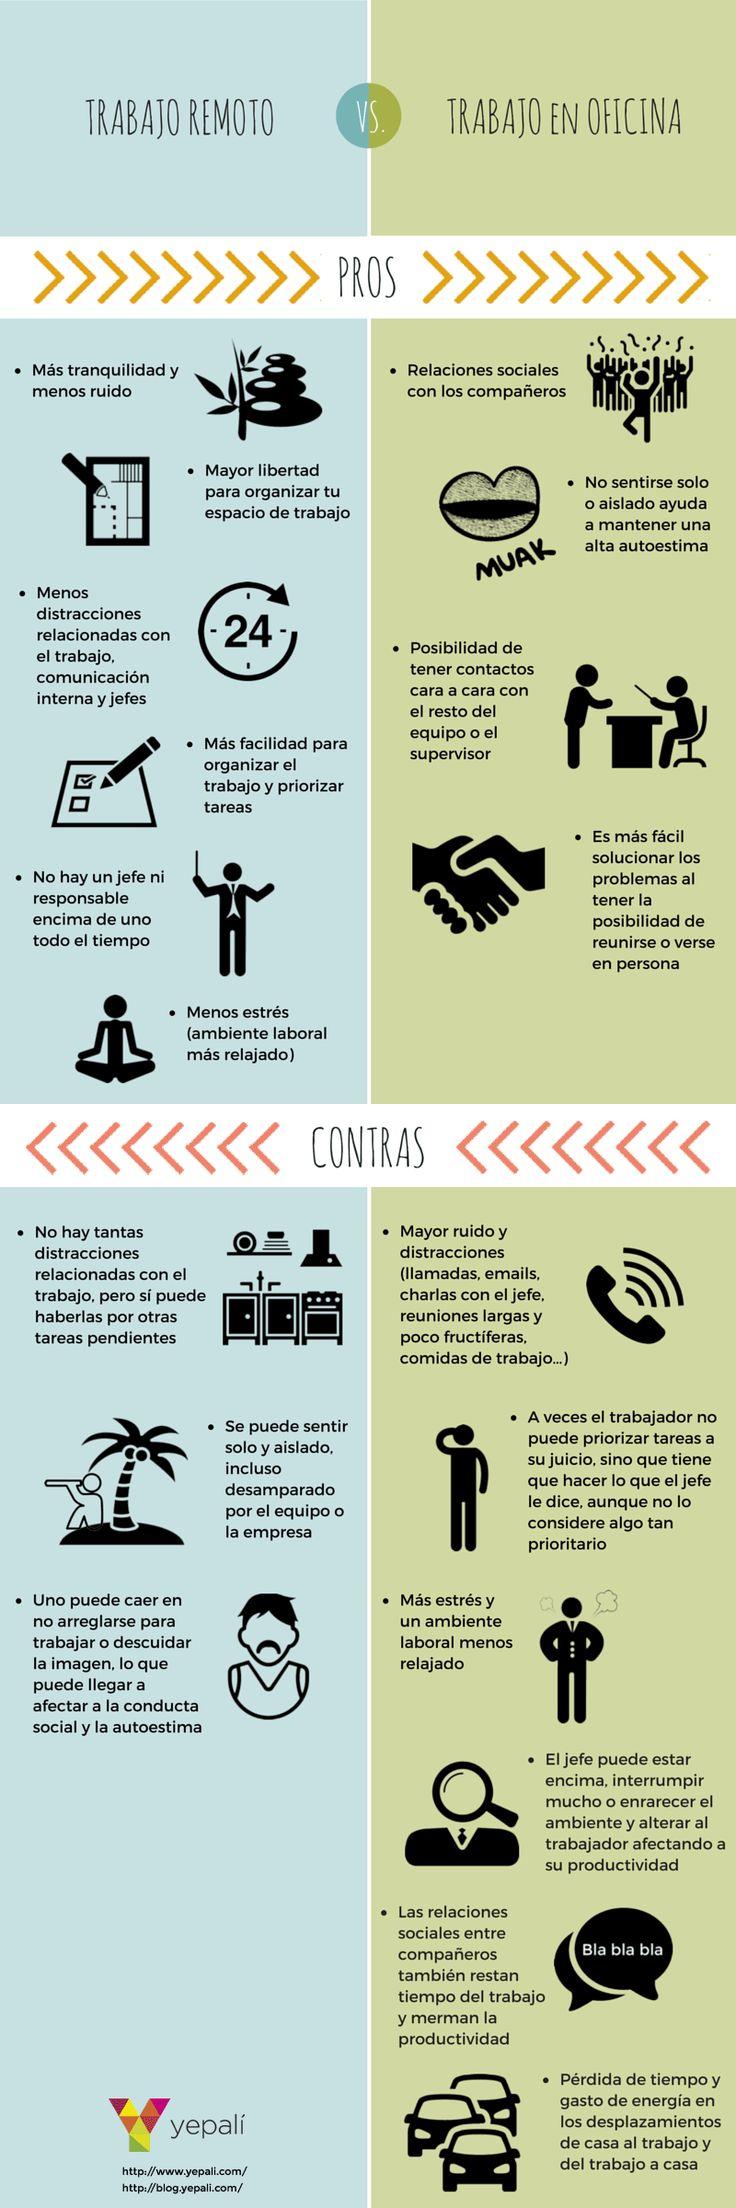 Teletrabajo vs trabajo en la oficina #infografia #infographic #rrhh